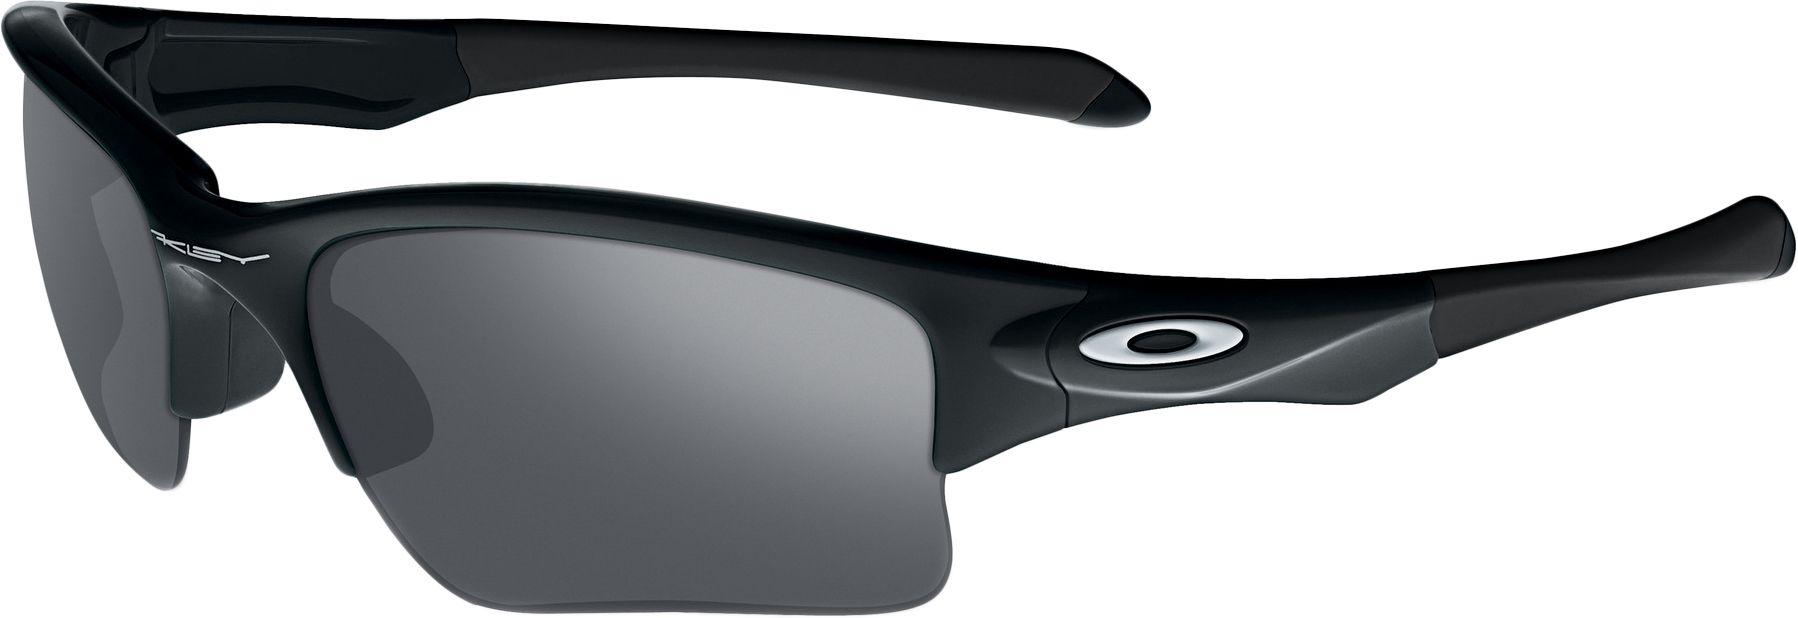 1b1083780ce Lyst - Oakley Youth Quarter Jacket Baseball Sunglasses in Black for Men